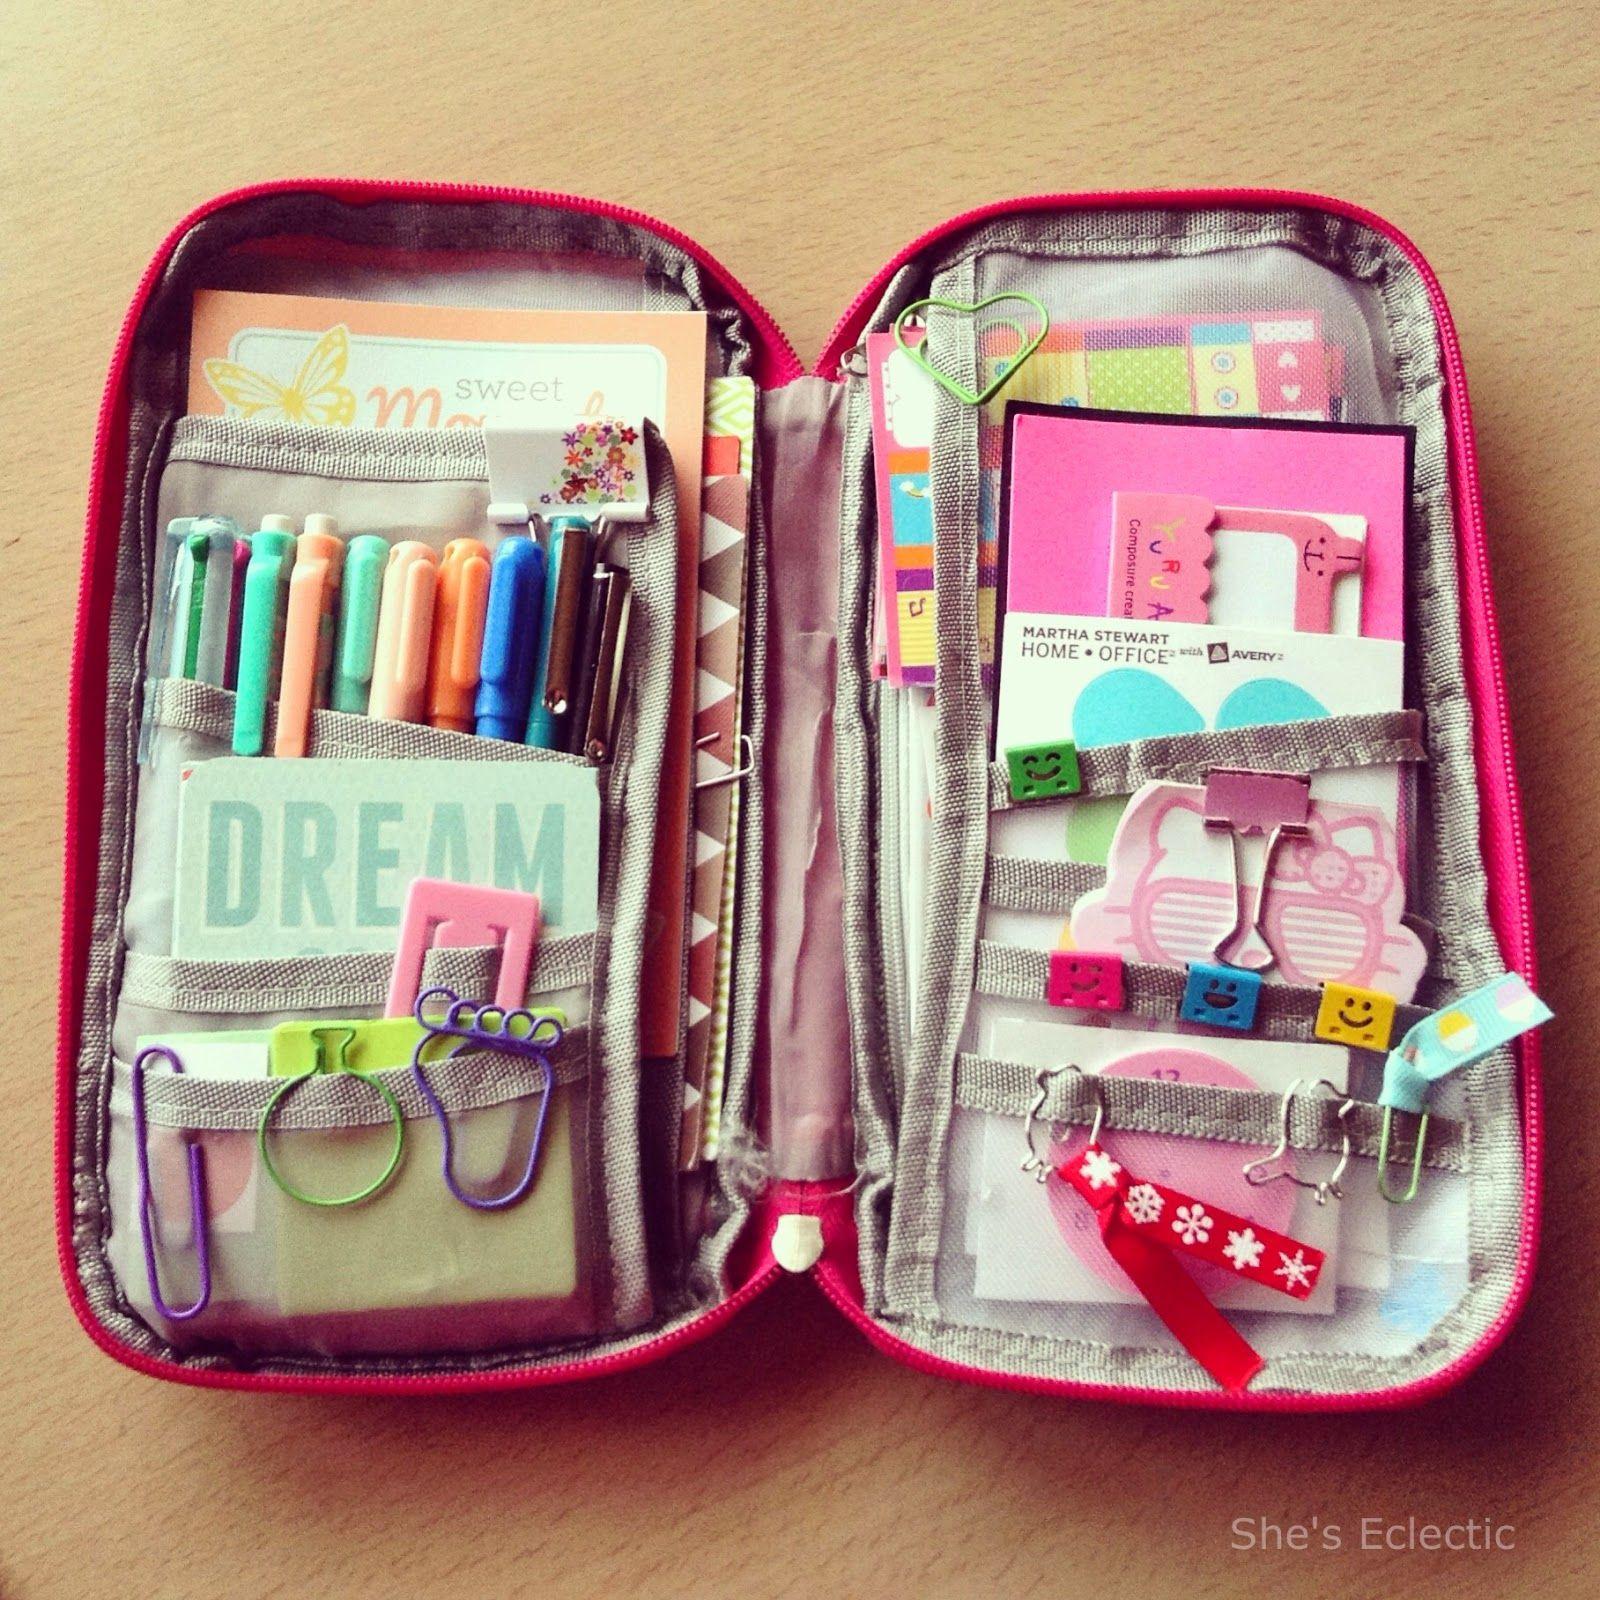 Decorate Pencil Case Diy Binder Organizer Duct Tape Zipper Pouch Pen Holder